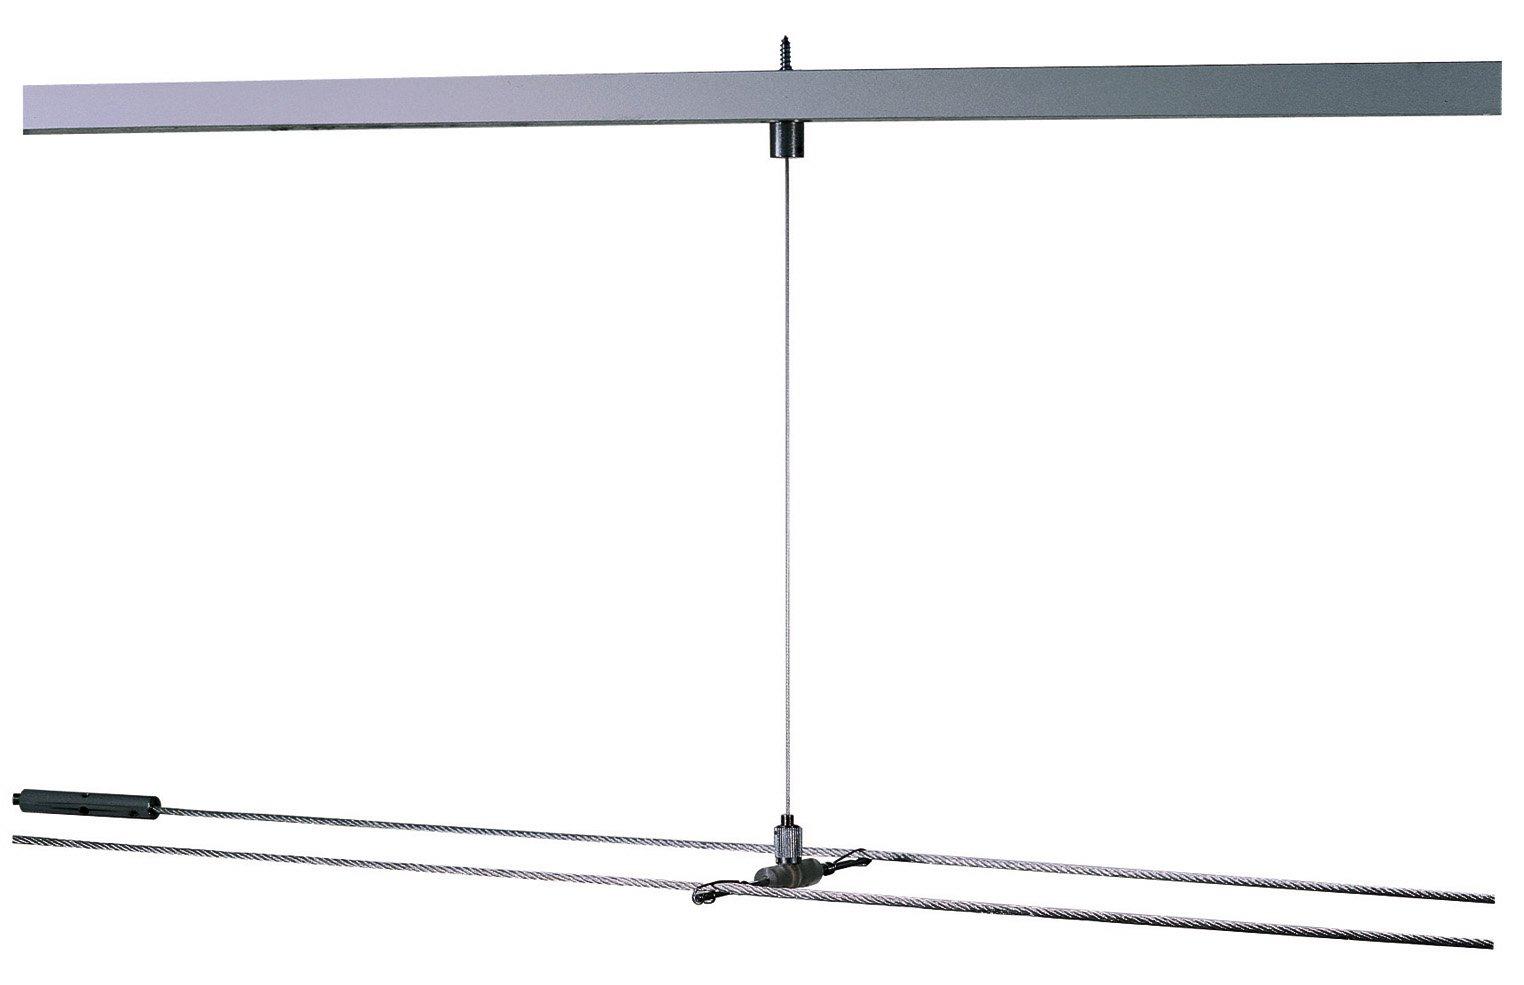 Tech Lighting 700PRTD3S Accessory - Kable Lite Adjustable Standoff, Choose Finish: SN: Satin Nickel Finish